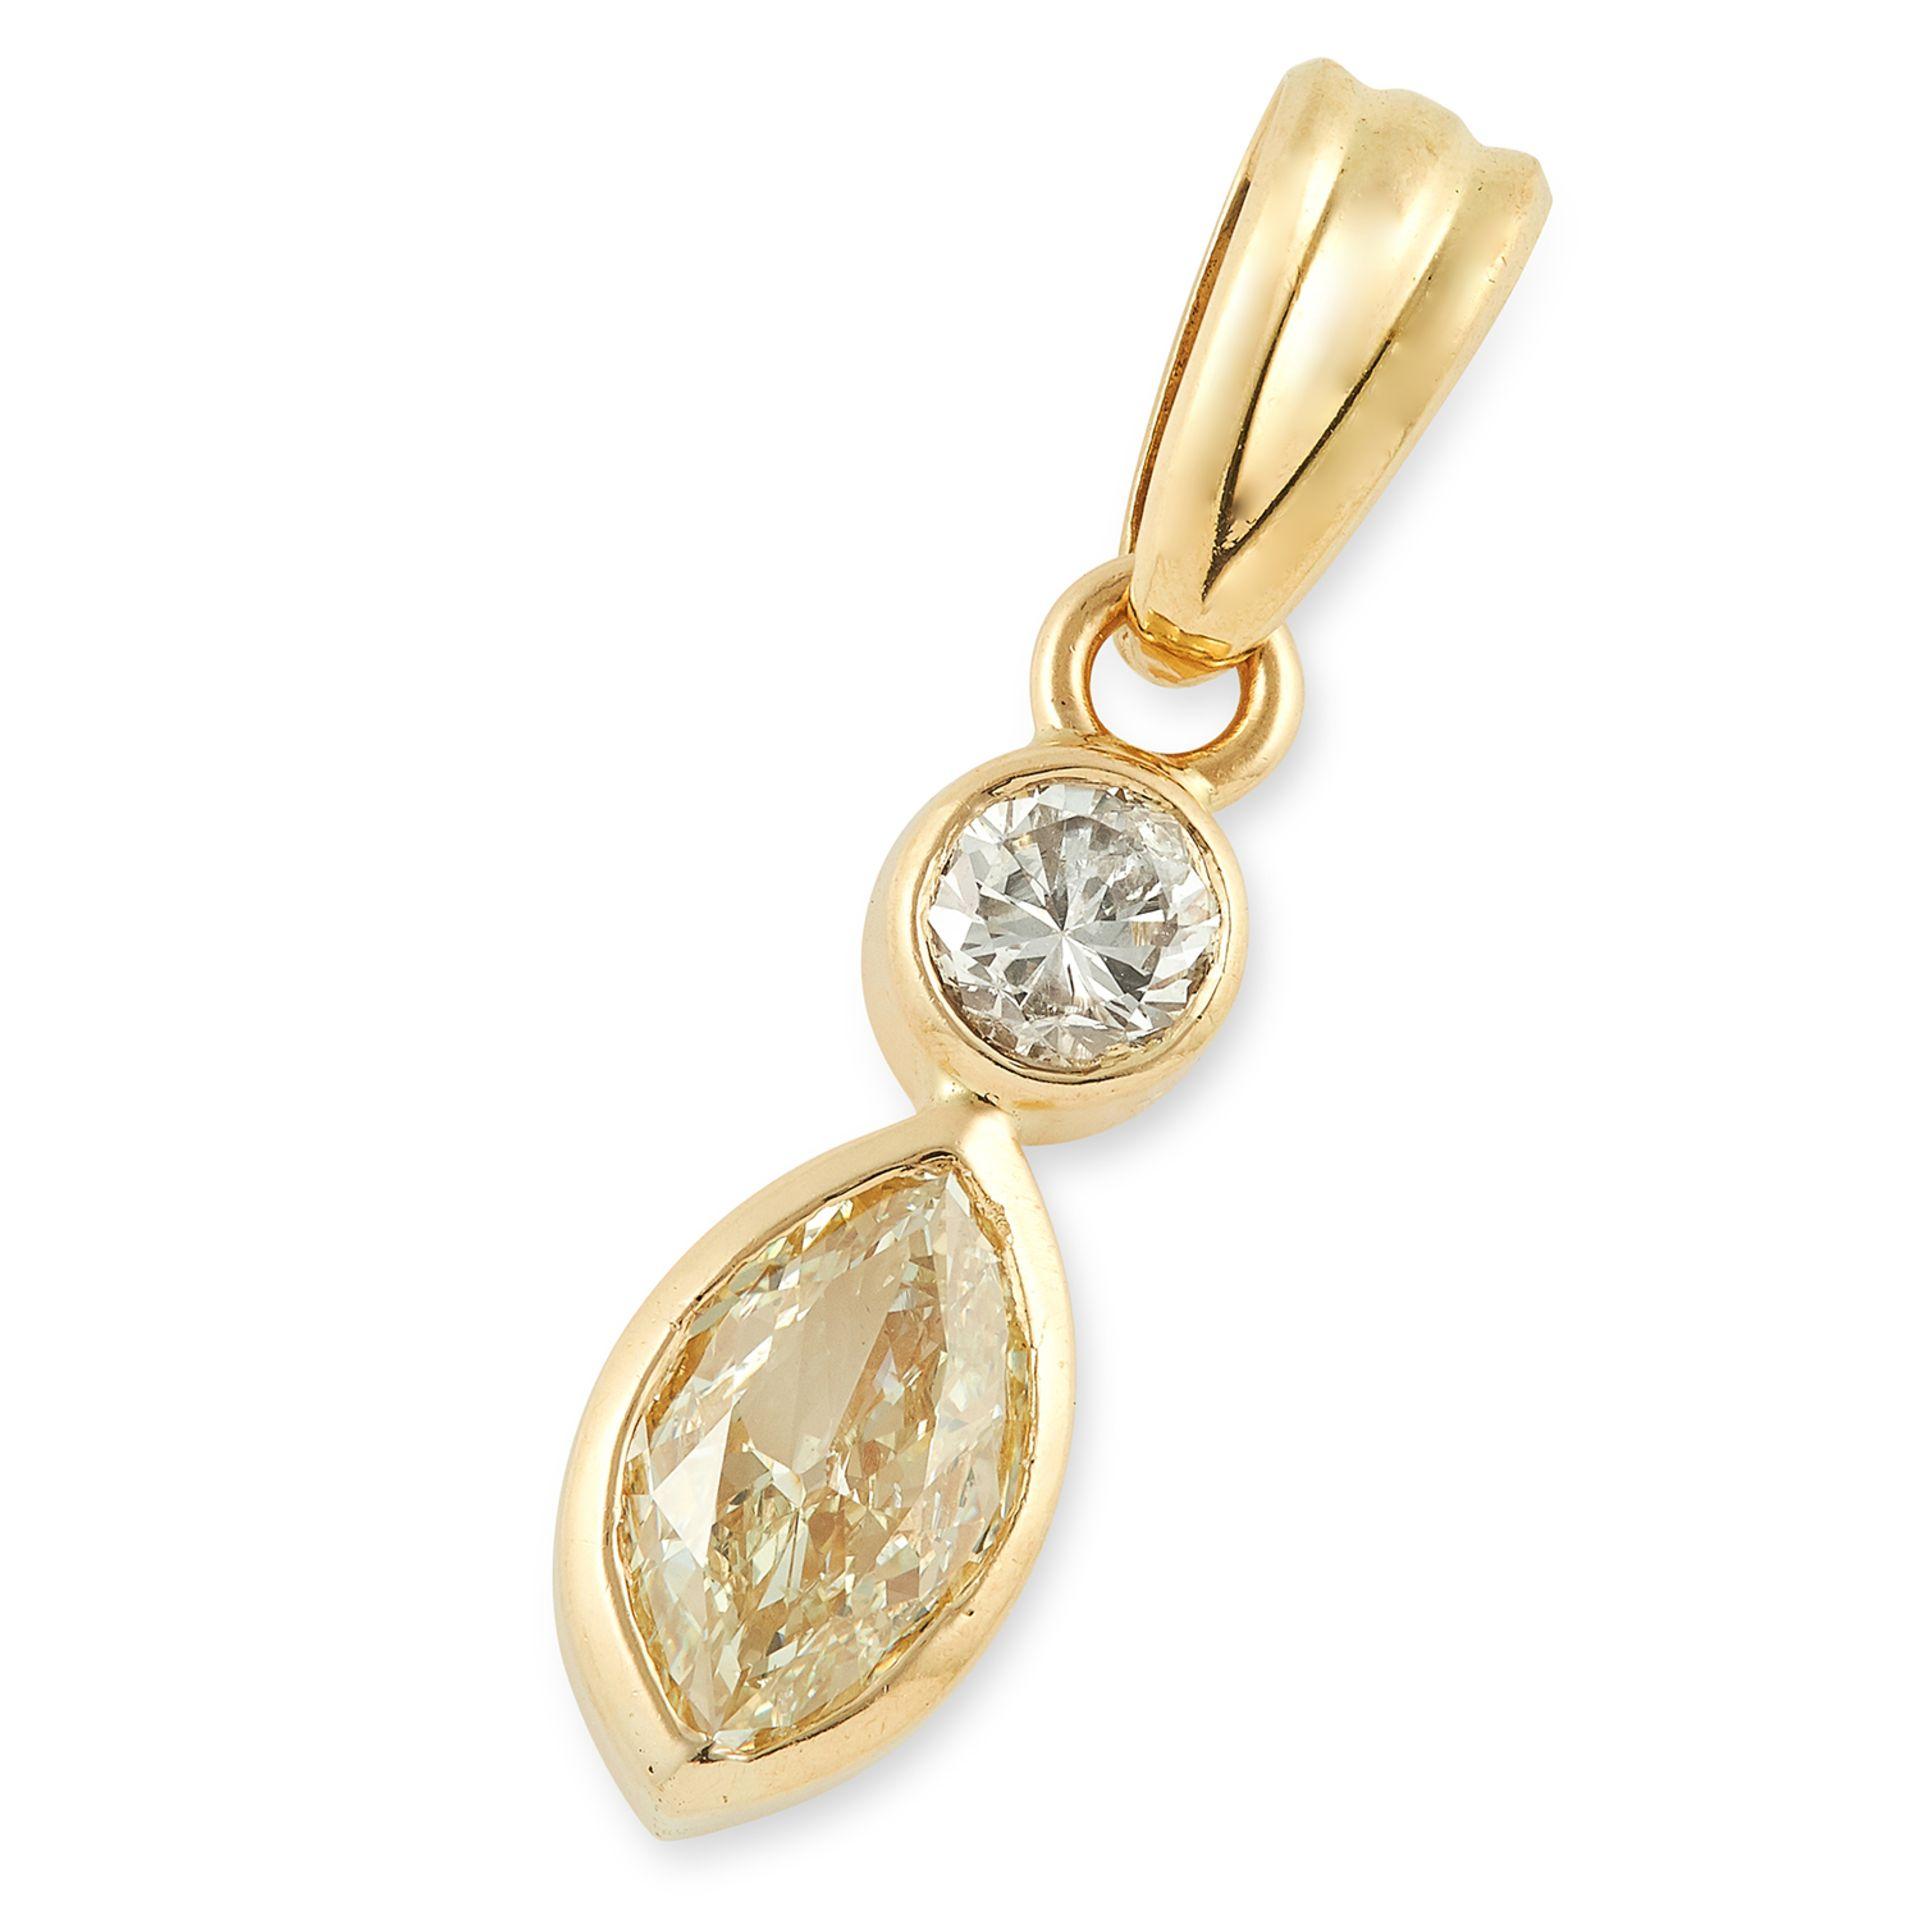 DIAMOND PENDANT set with a marquise cut yellow diamond and a round cut diamond, 2.7cm, 3g.